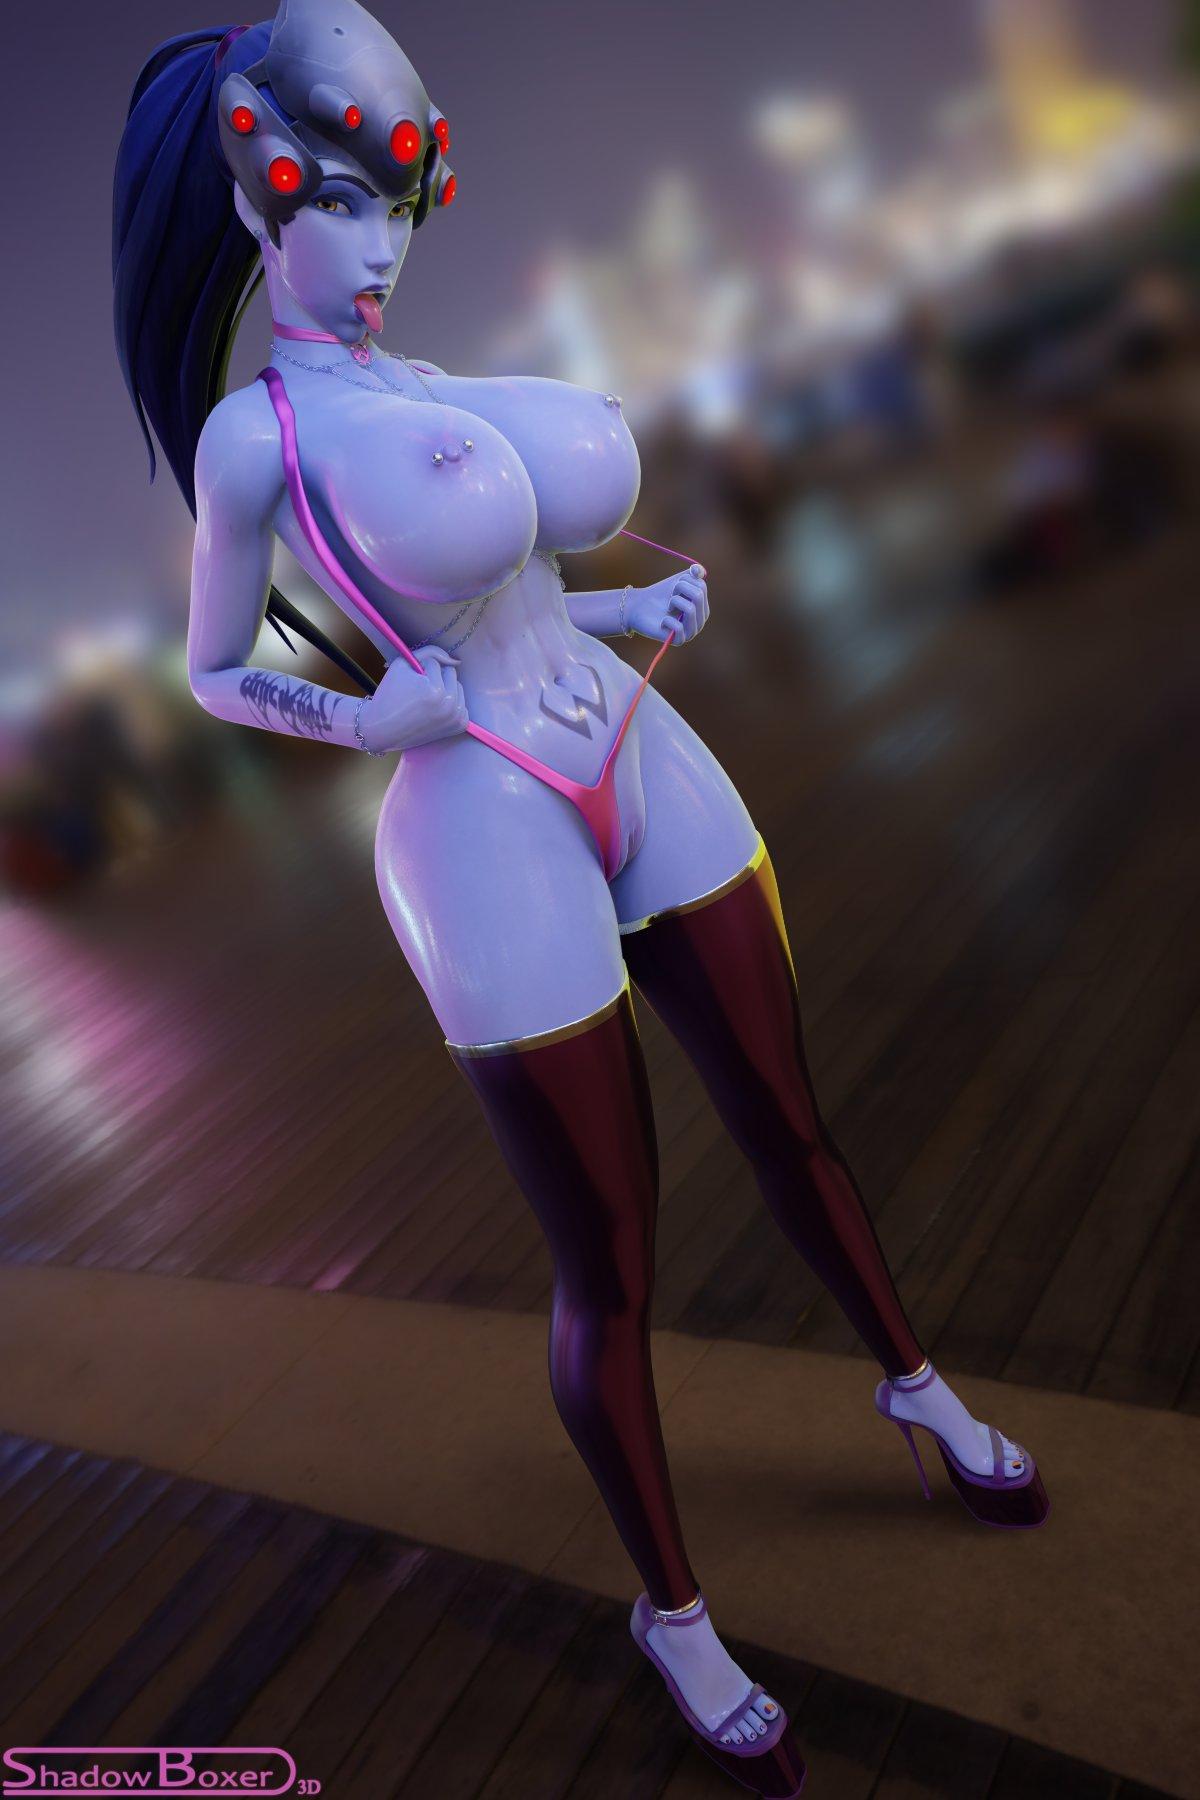 overwatch-xxx-art-–-female,-widowmaker,-blender,-ls,-thick-thighs.